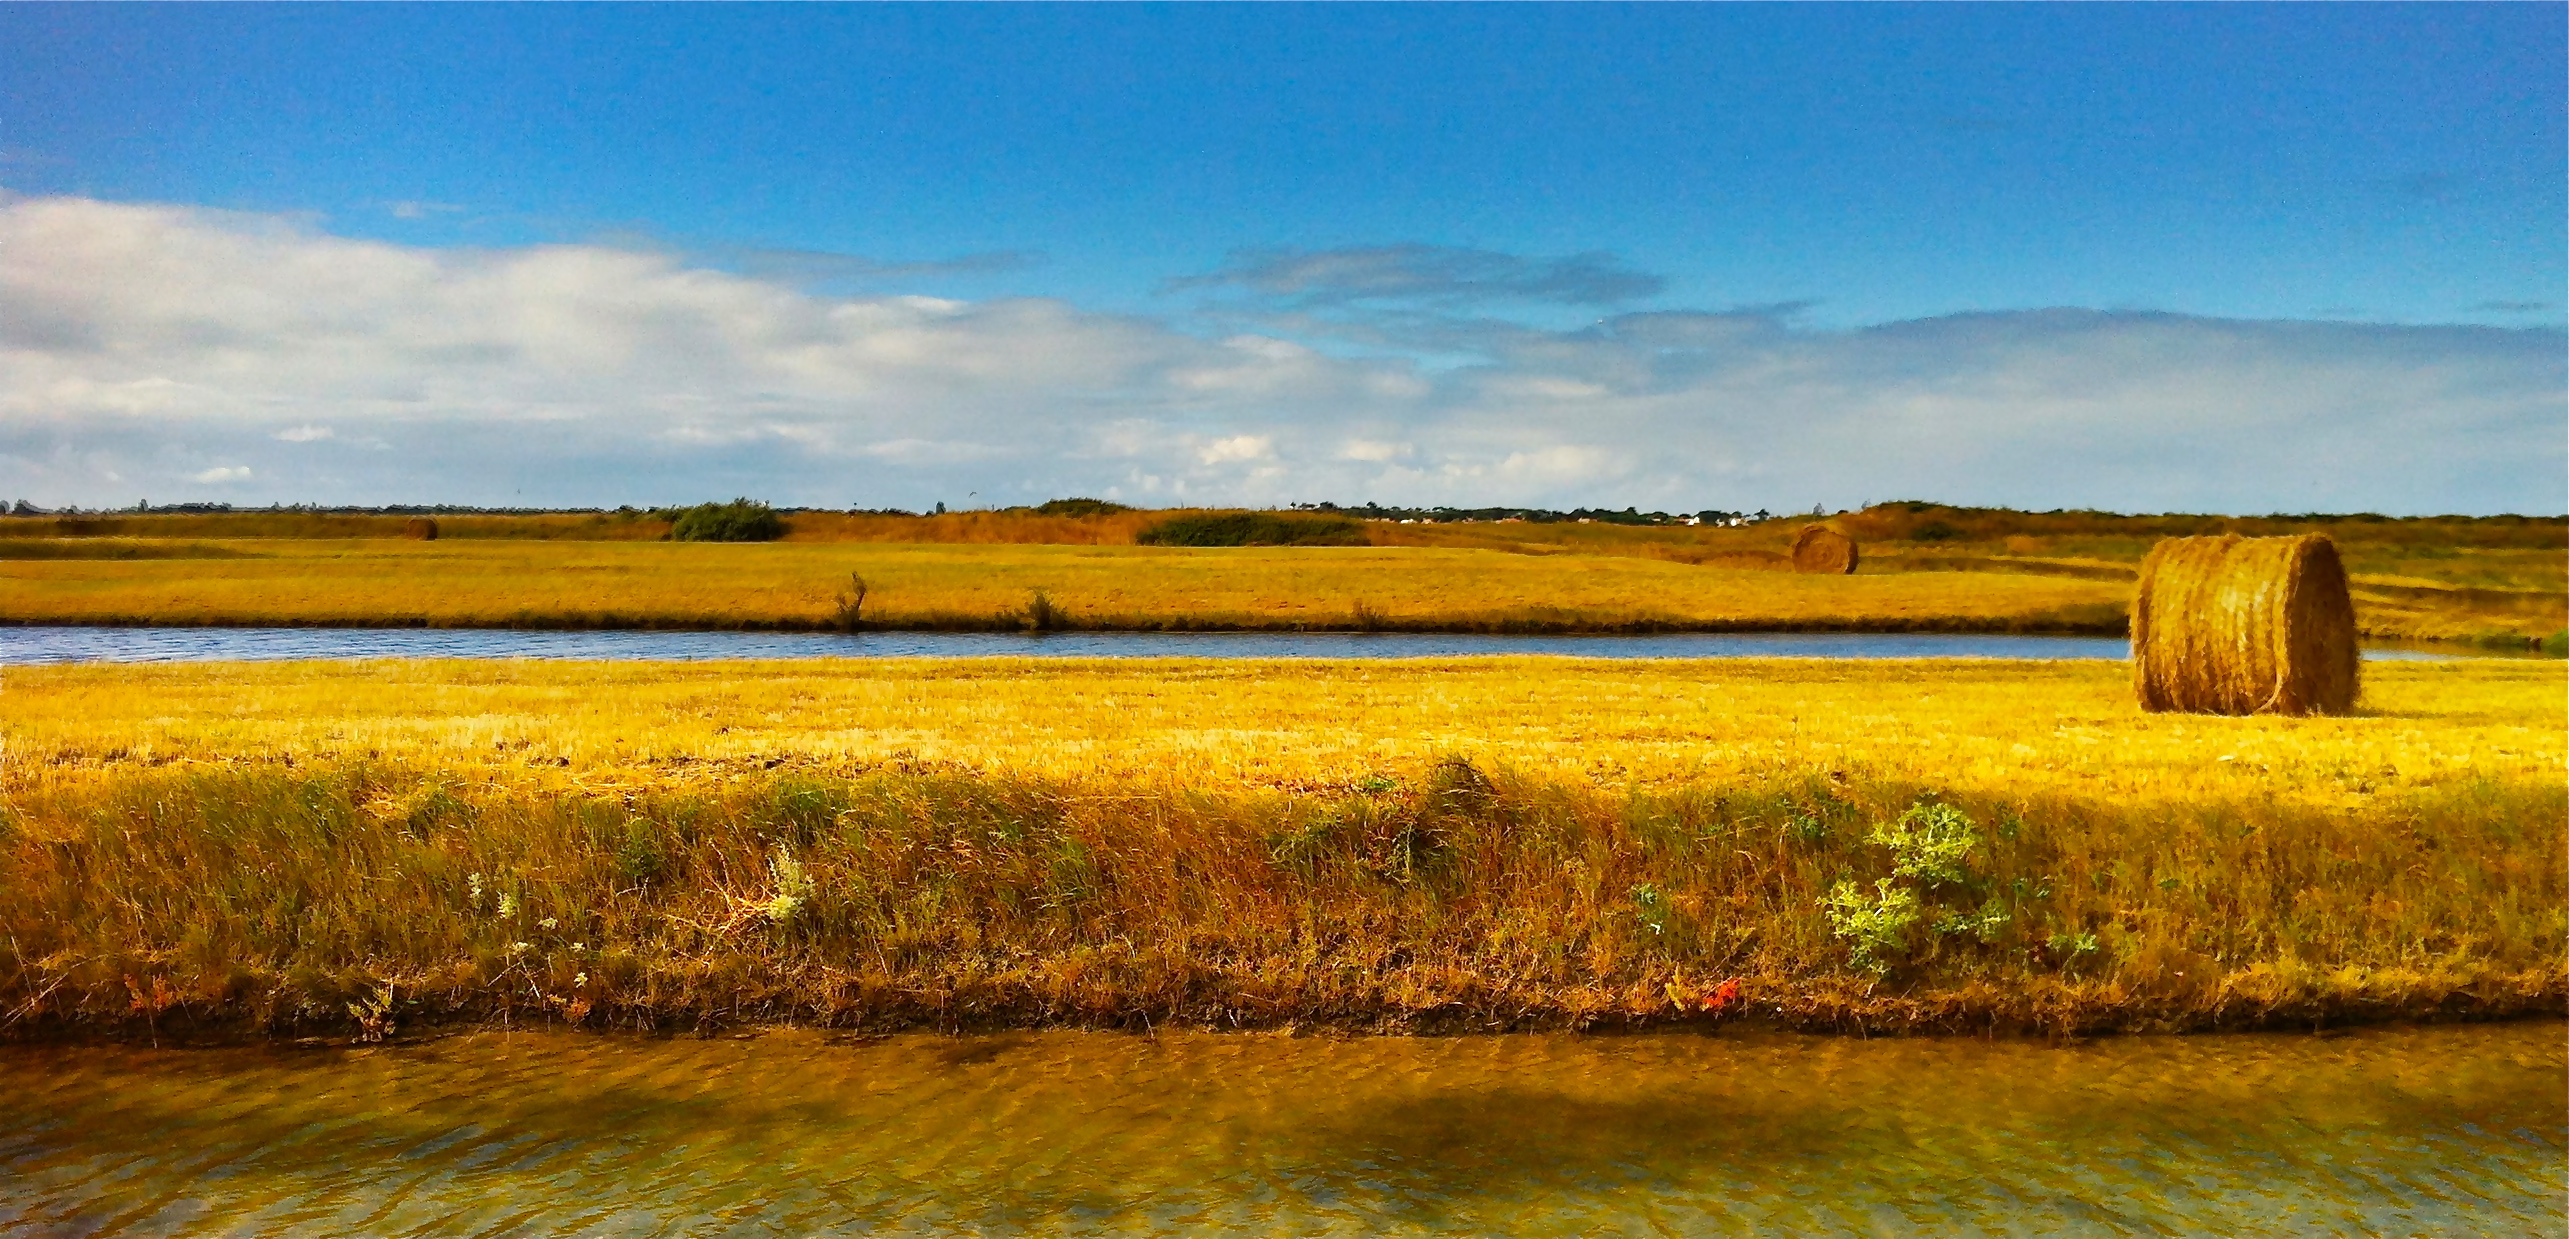 Isle de noirmoutier flojohn travels